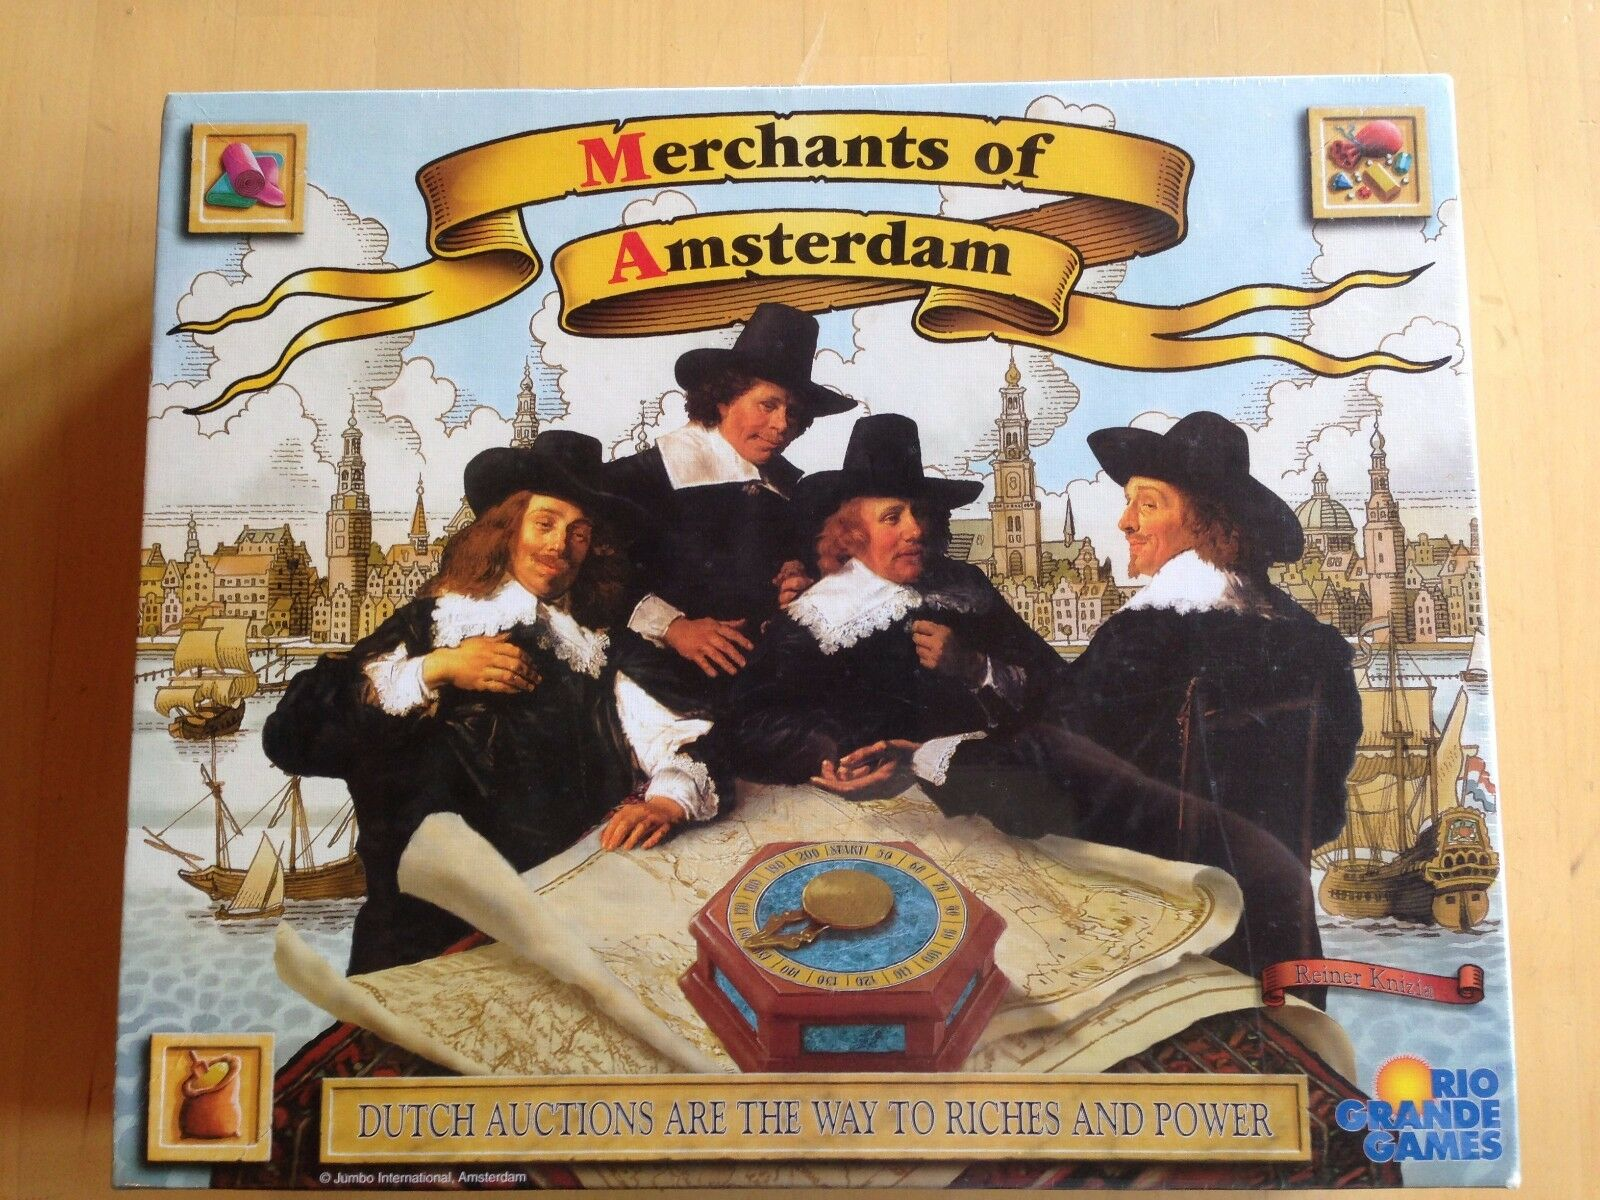 Merchants Of Amsterdam, Rio Grande Games, New